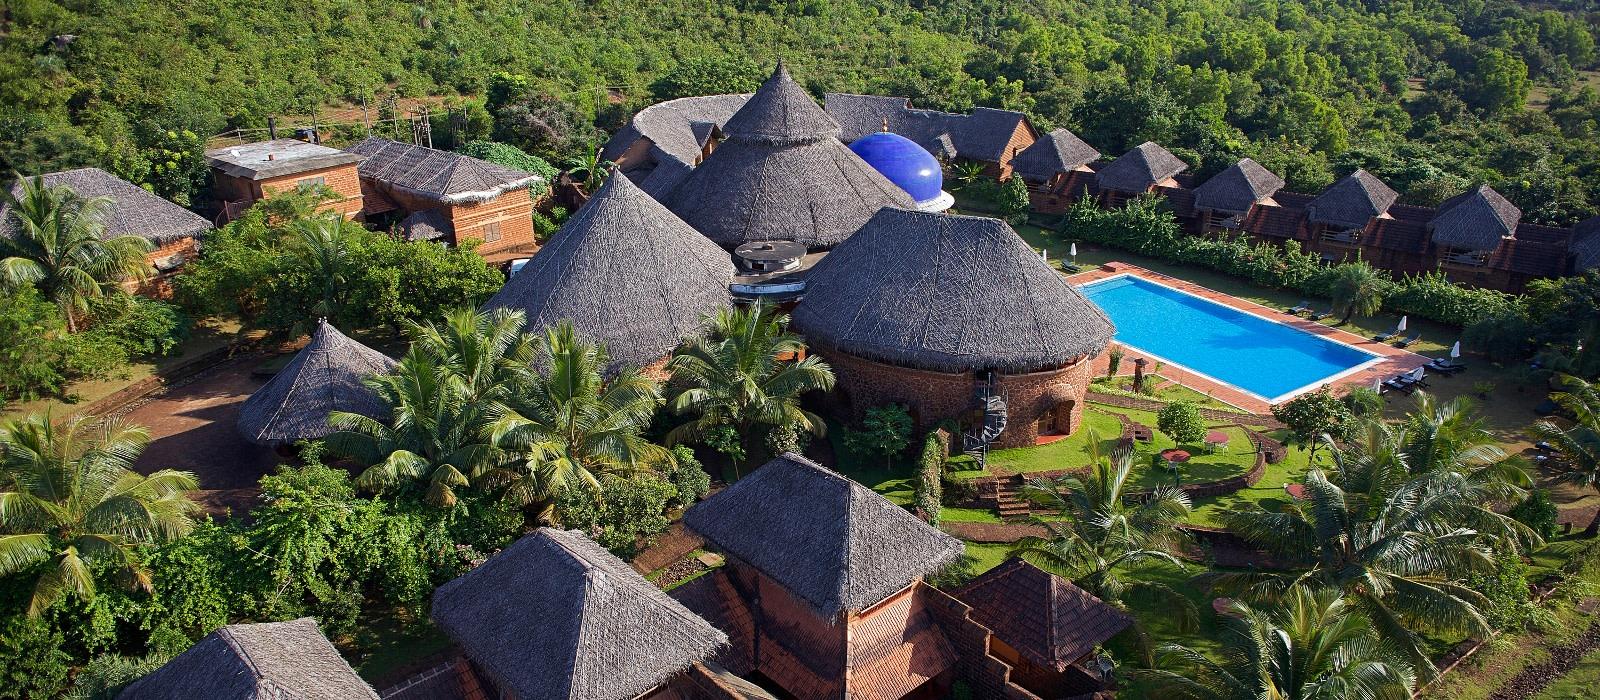 Hotel SwaSwara South India